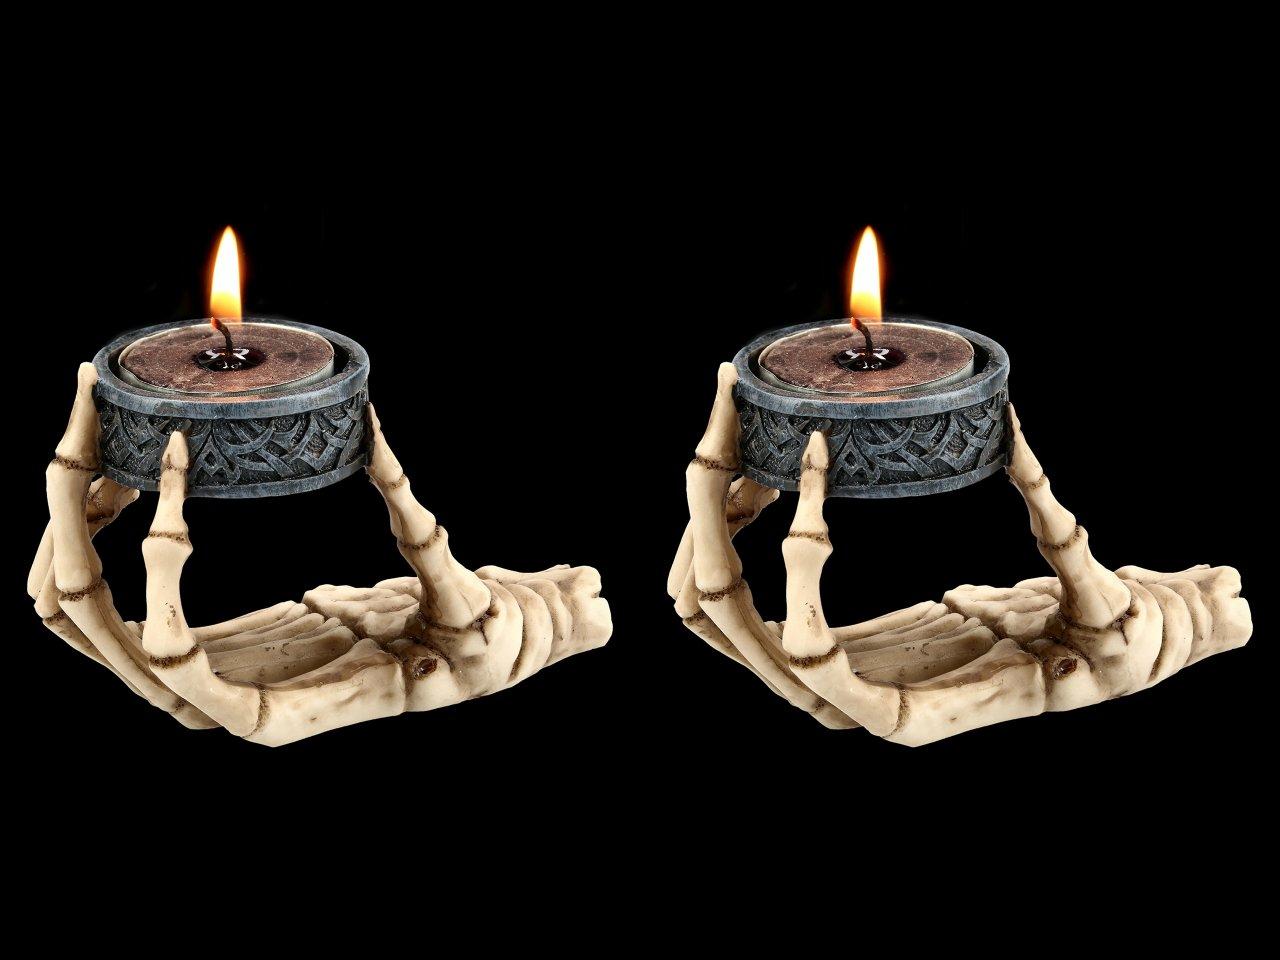 Skeleton Hand Tealight Holder - Set of 2